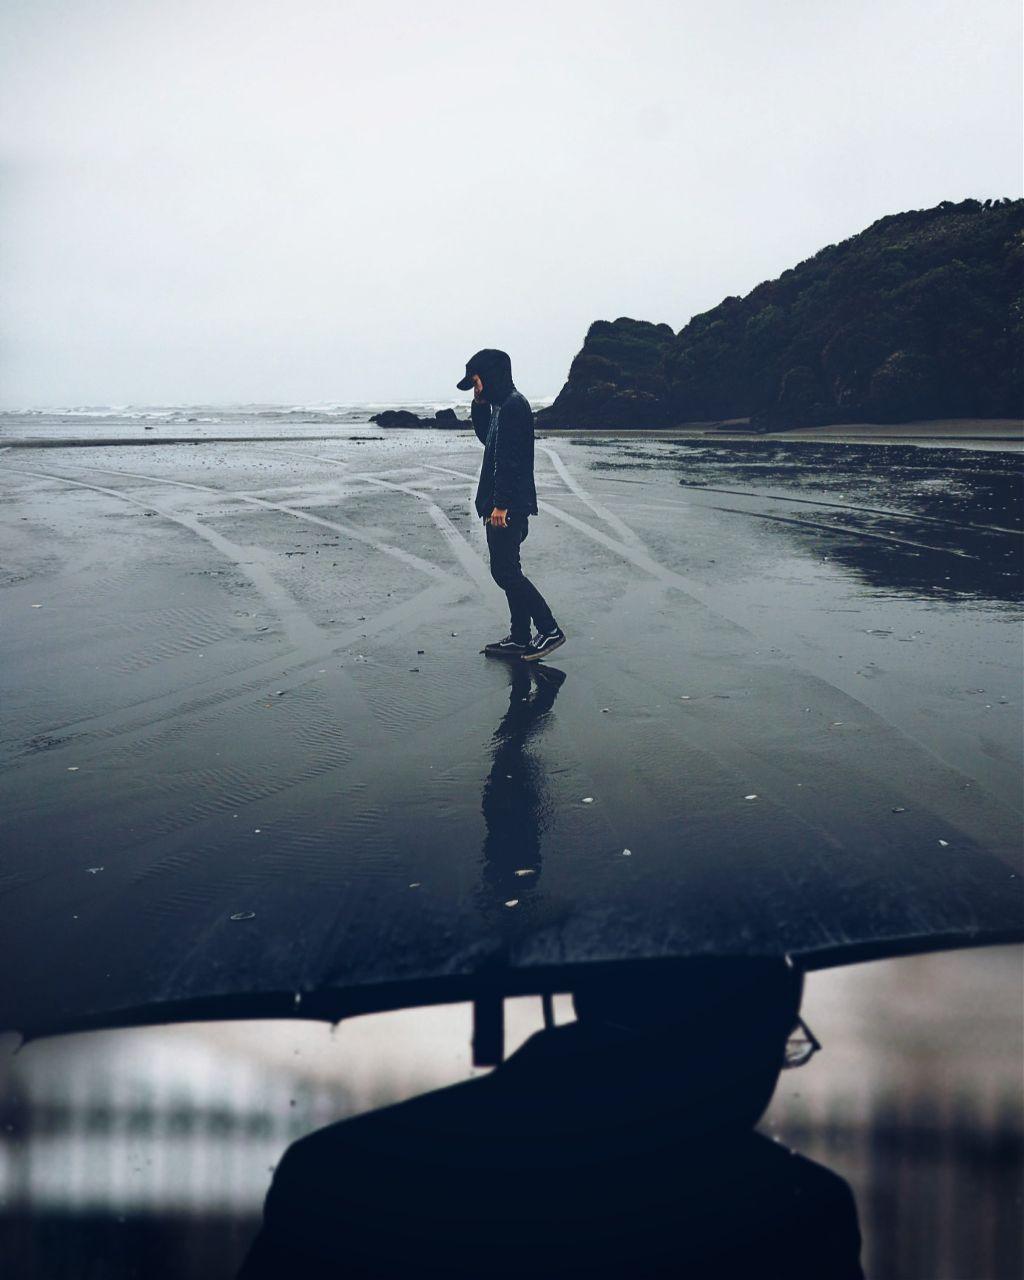 #freetoedit #doubleexposure #rain #umbrella